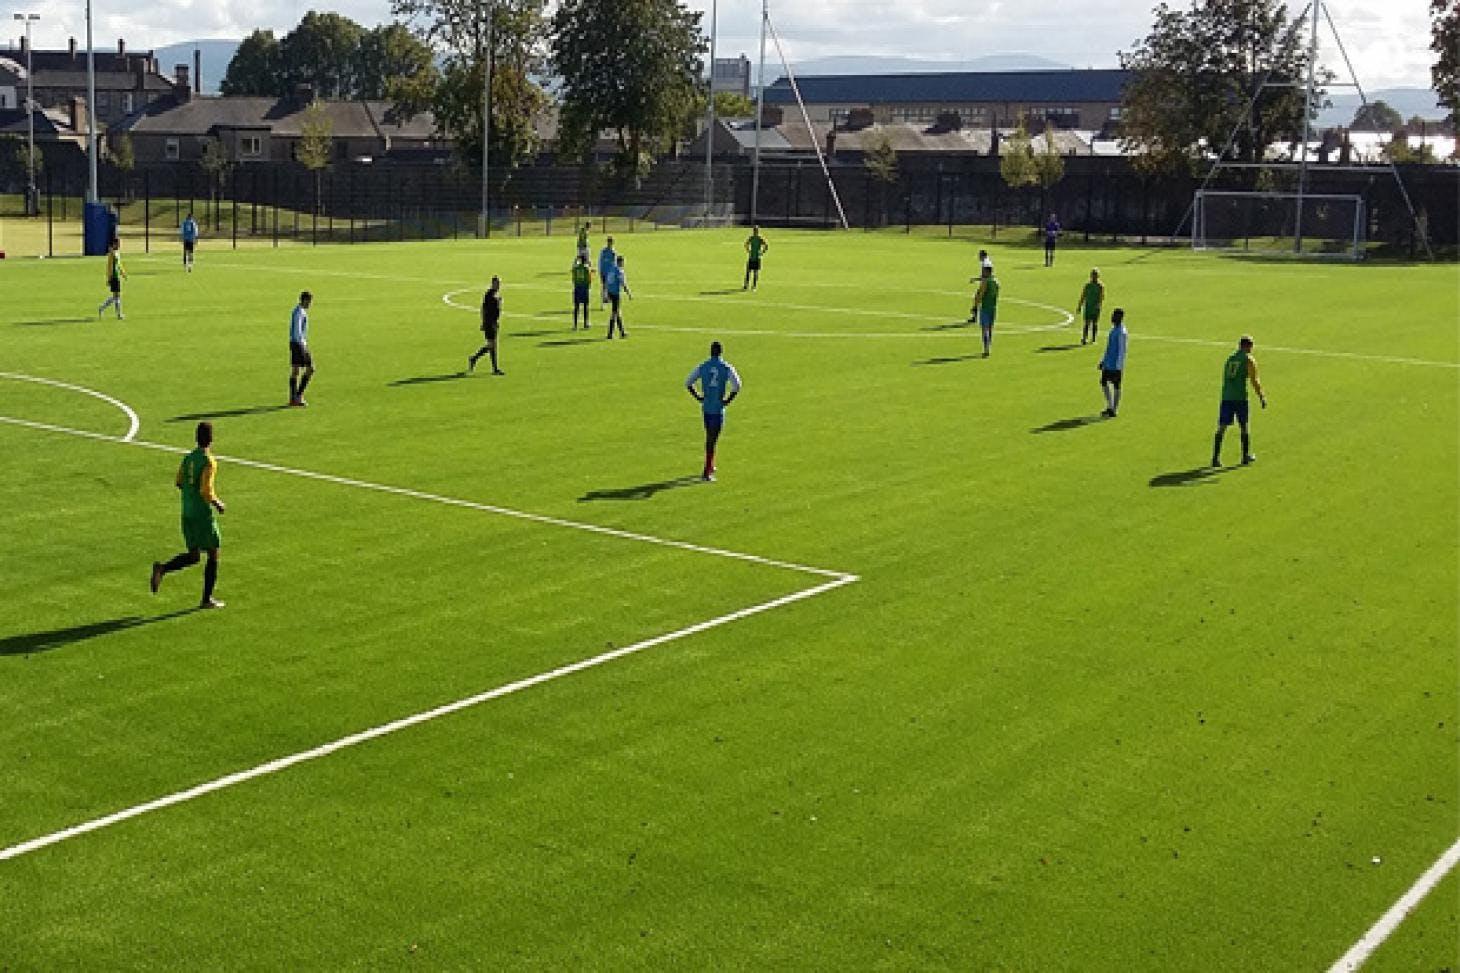 DIT Grangegorman 11 a side | Astroturf football pitch